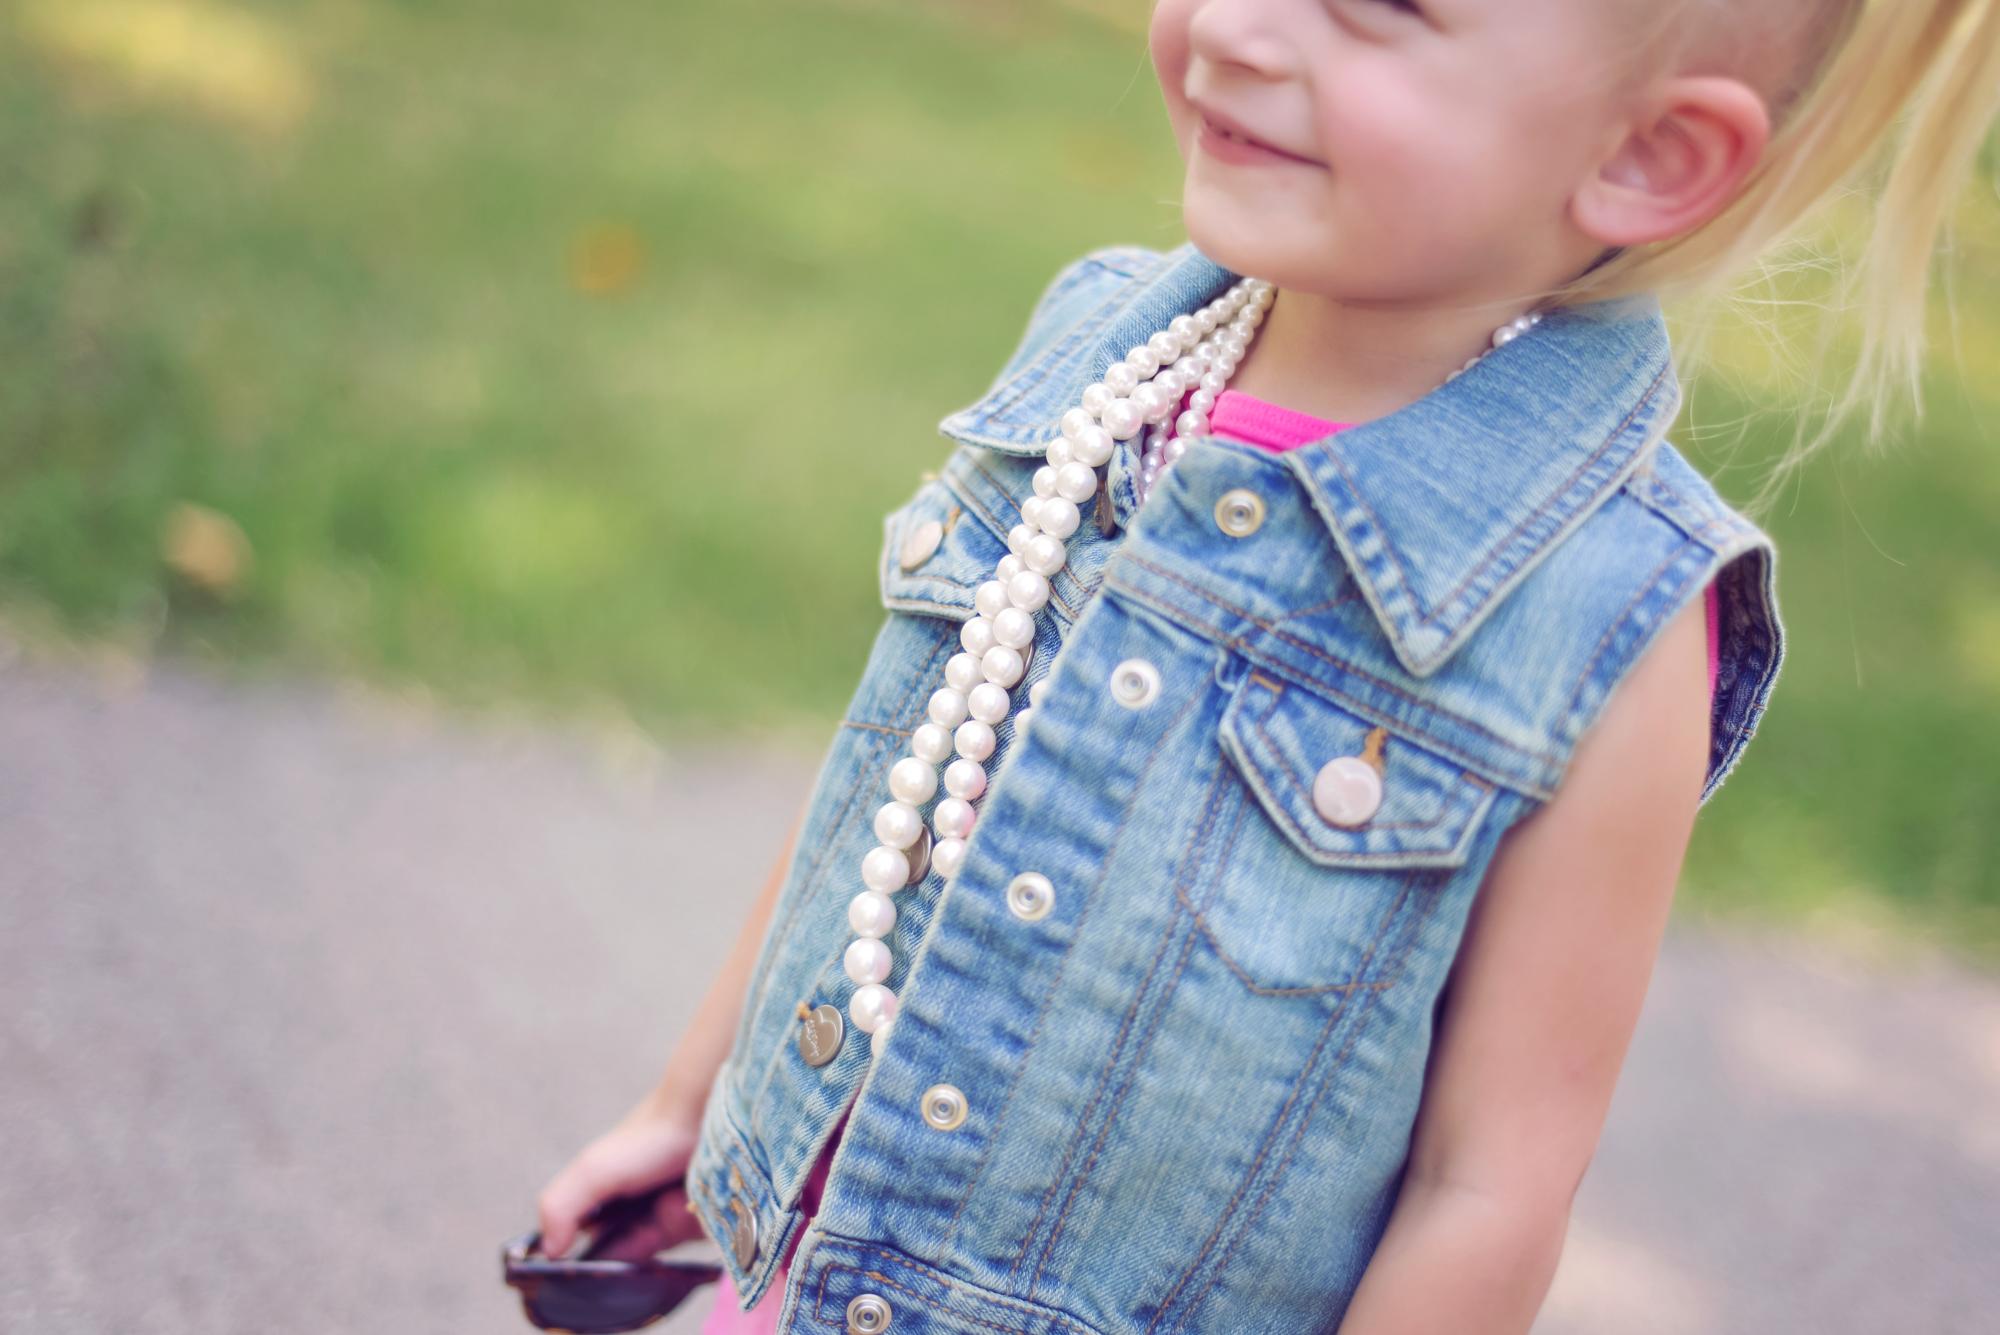 {Stylish Babes} Girly Sass Toddler Fashion || The Chic Blonde